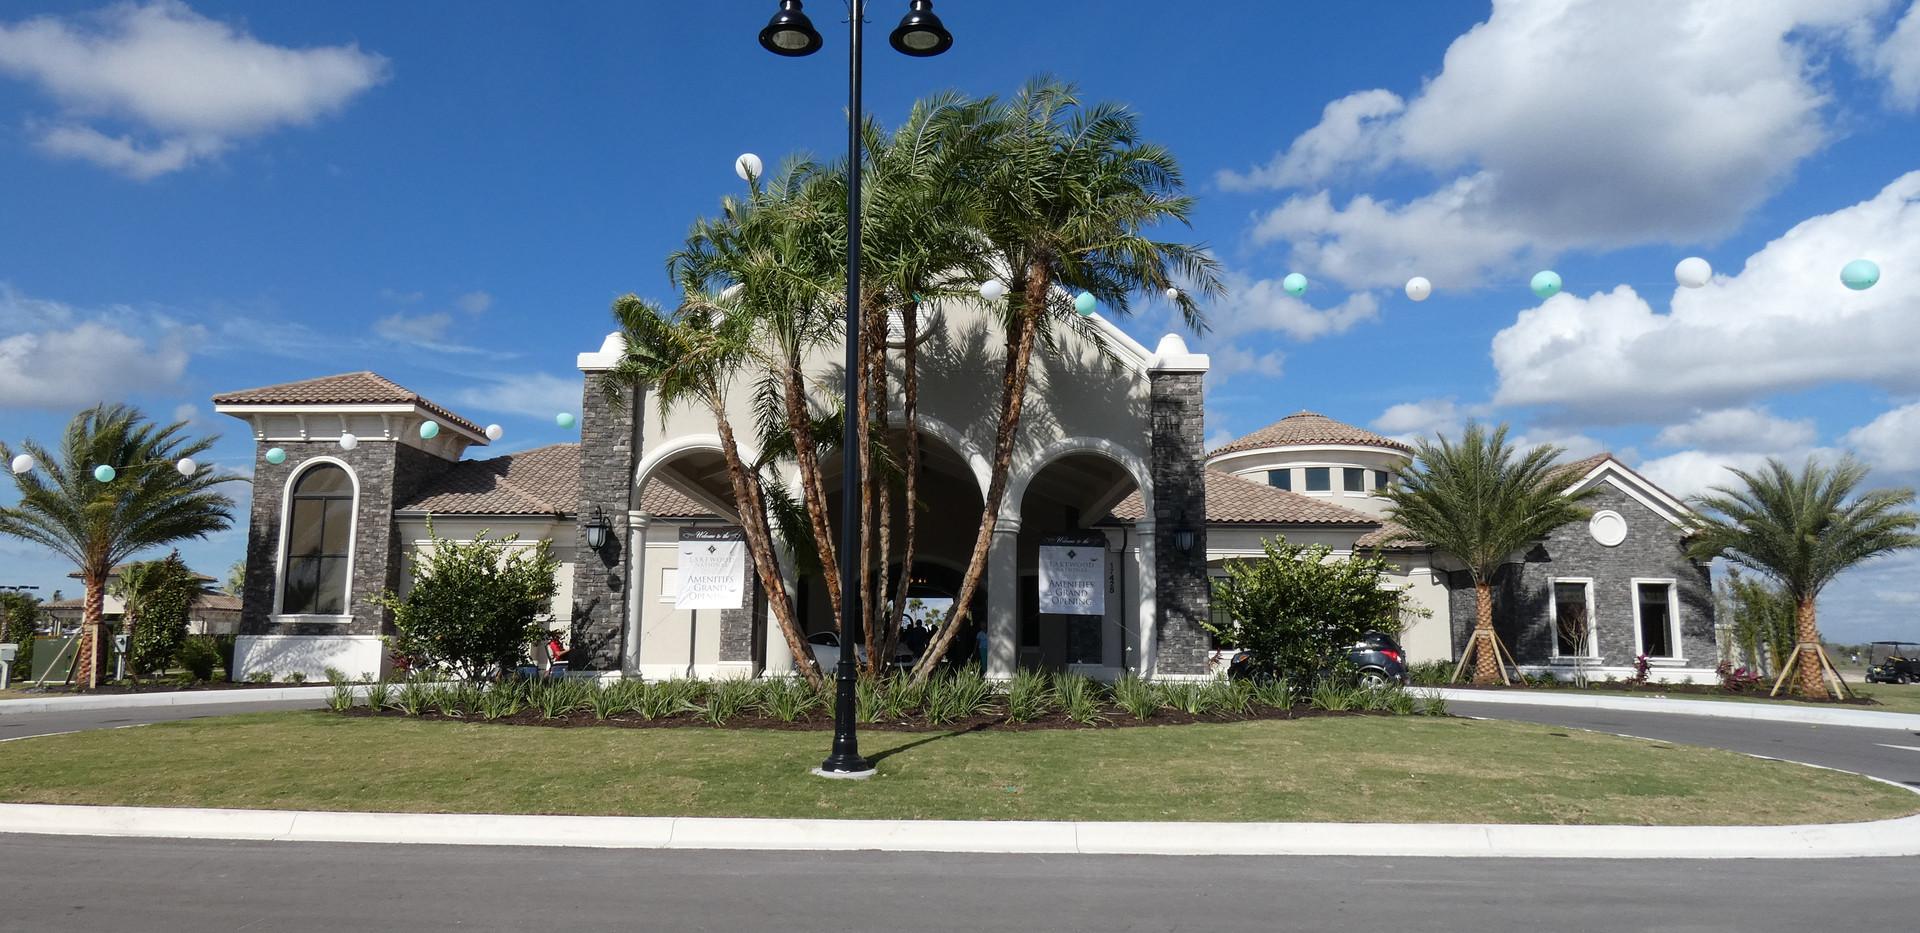 Lakewood National club house and pool